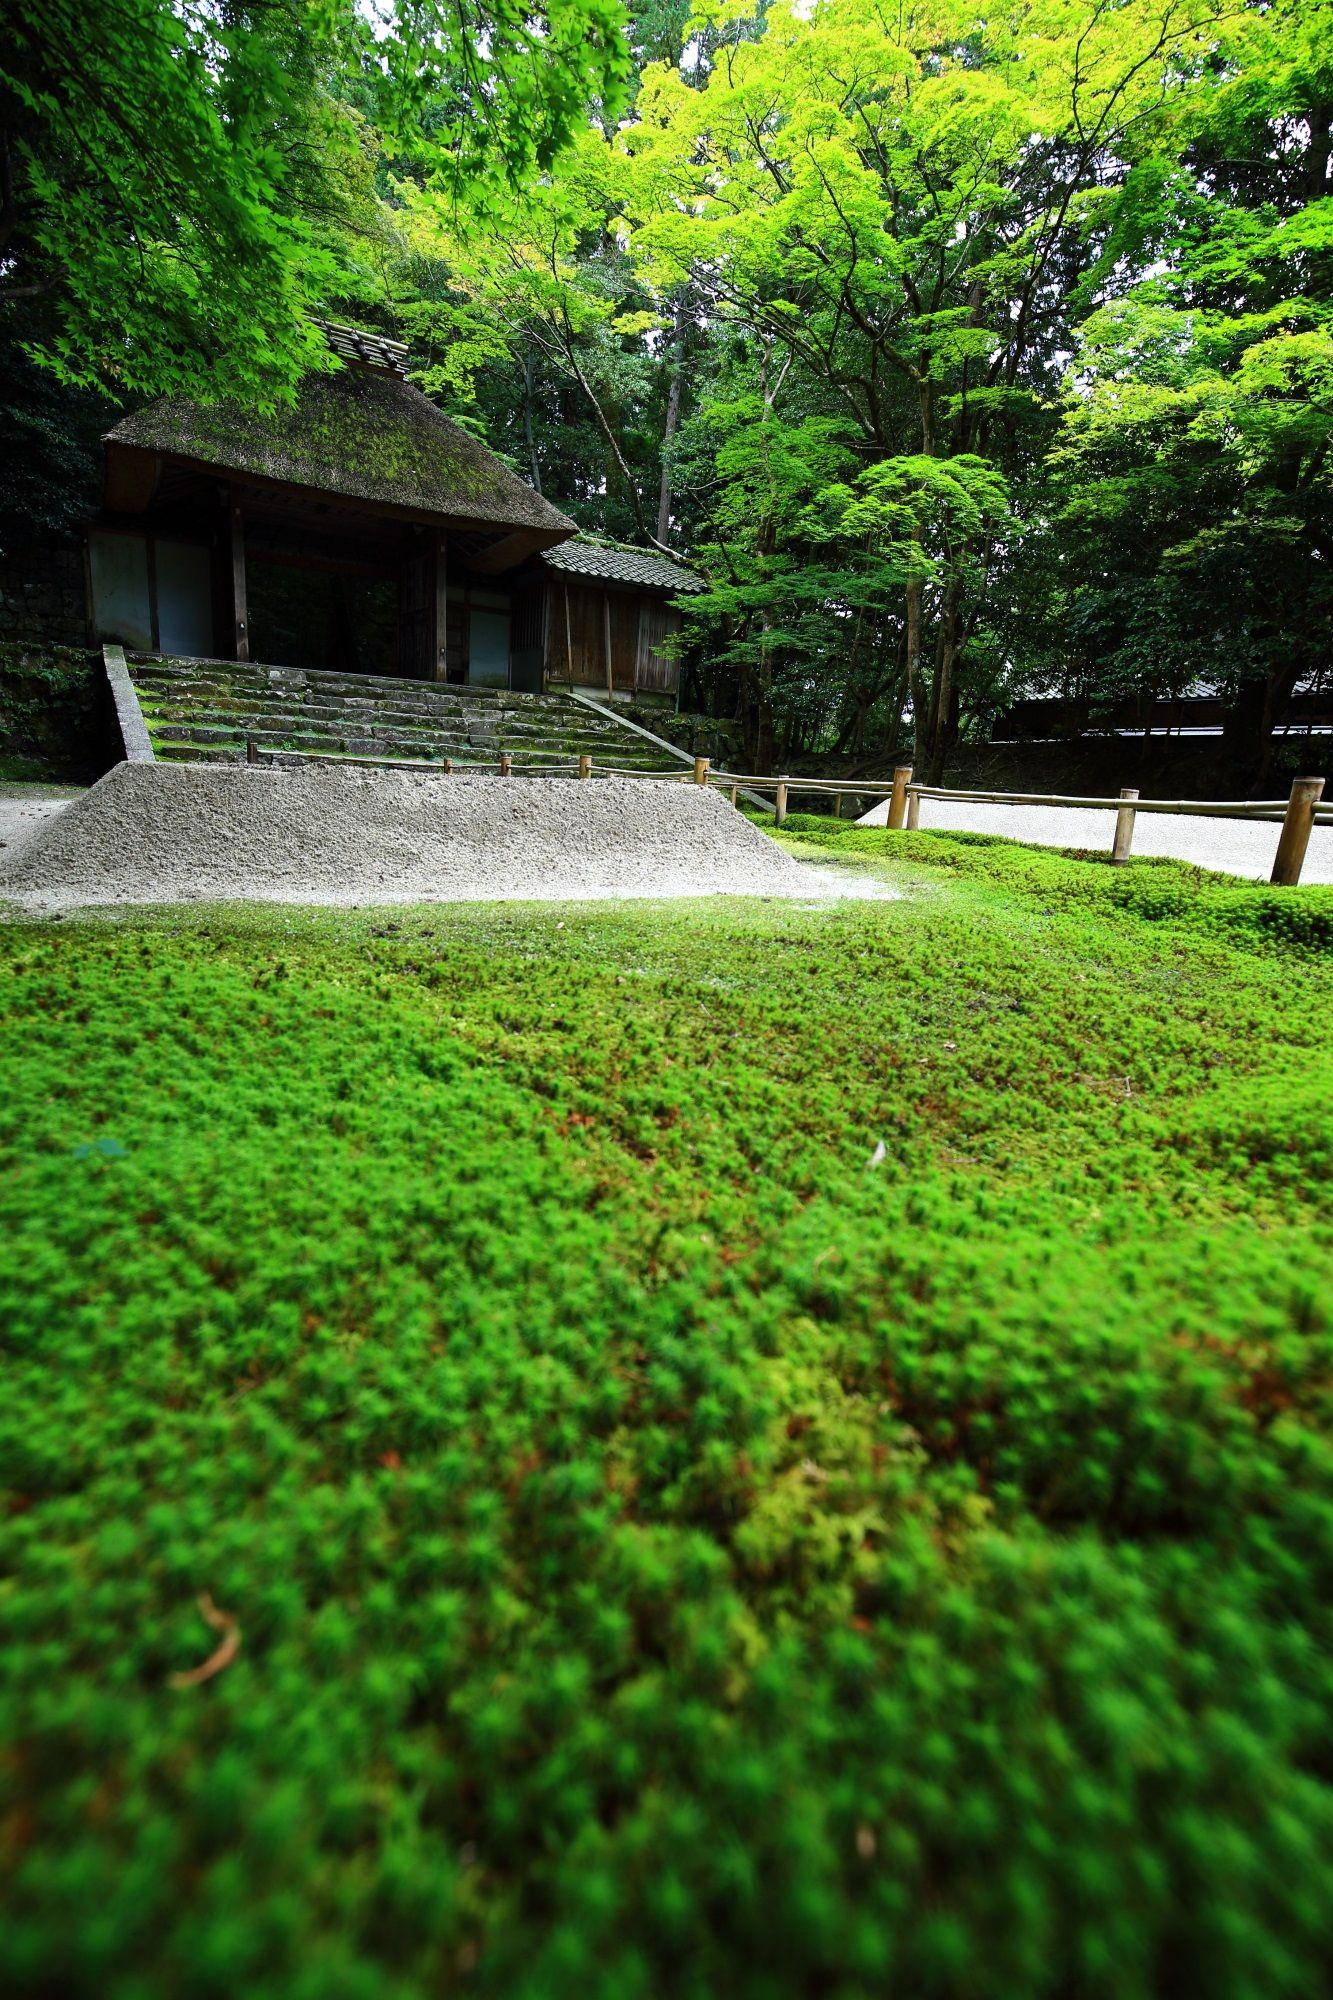 Honen Zen Gardensjapanese Gardensjapanese Beautyjapanese Artjapan Gardenmoss